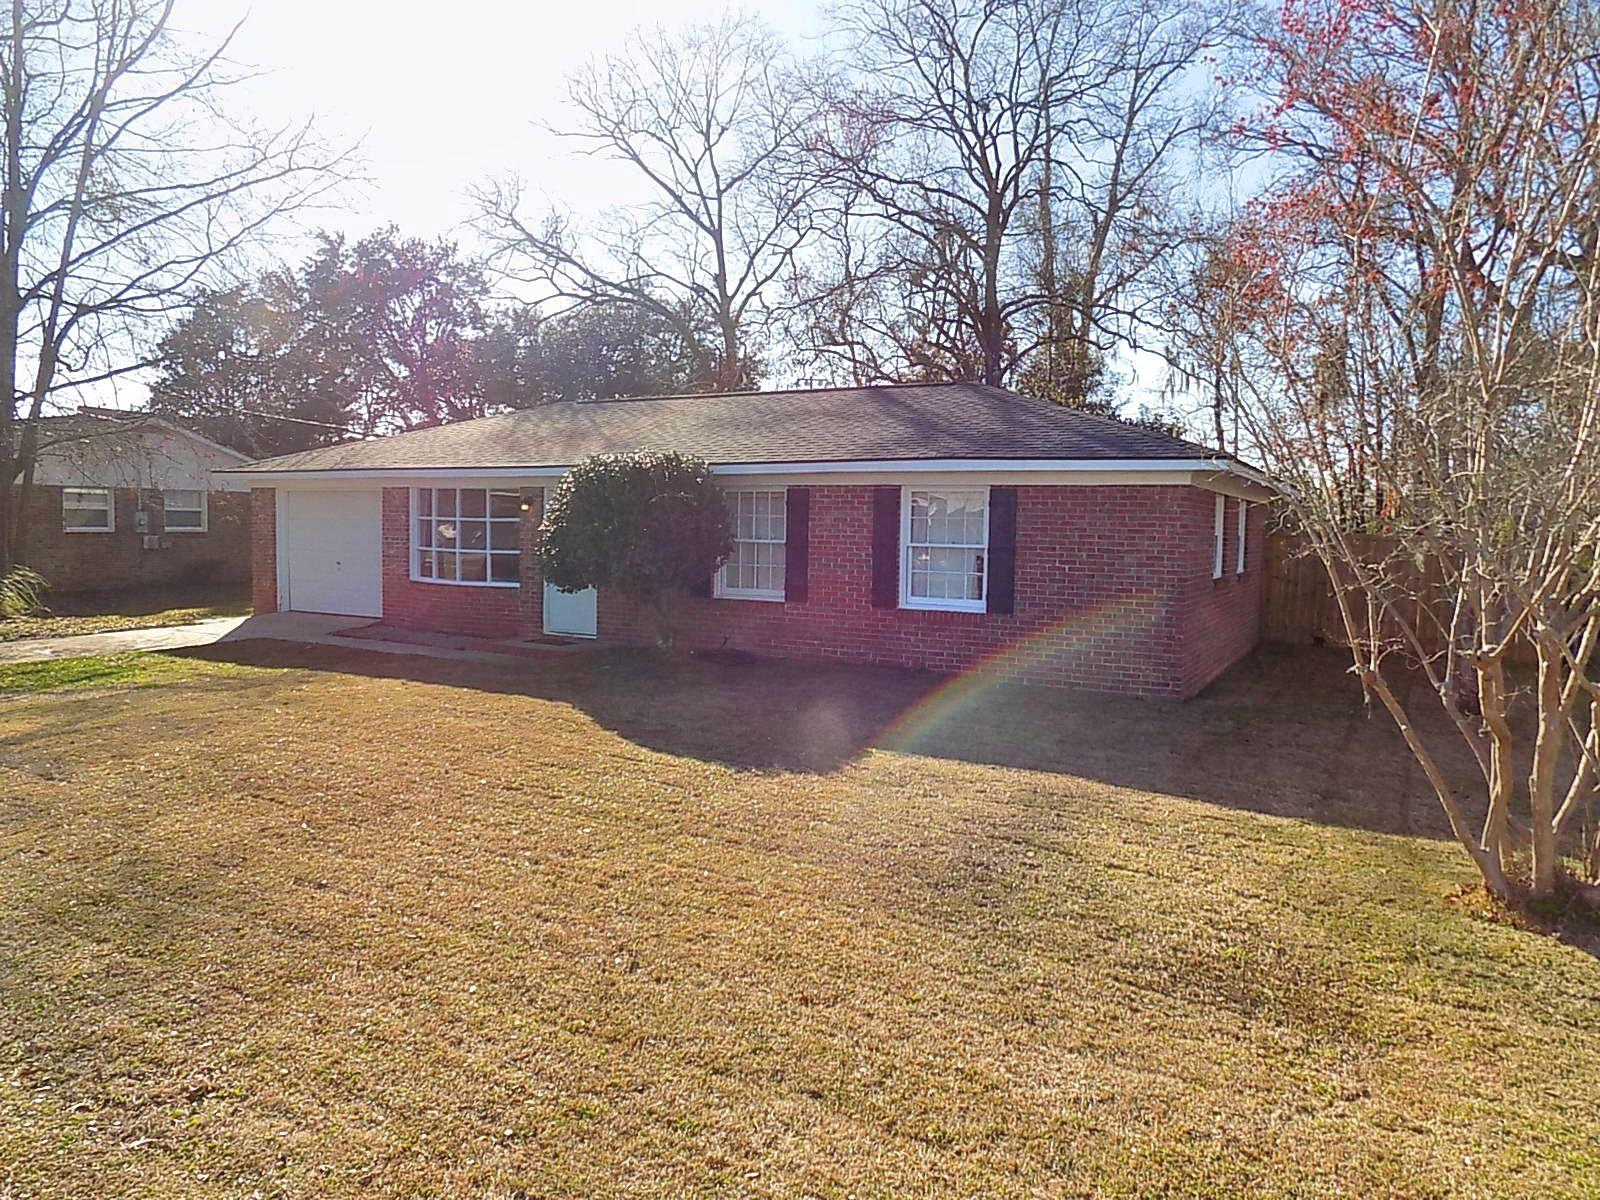 West Ashley Plantation Homes For Sale - 1720 Boone Hall, Charleston, SC - 25